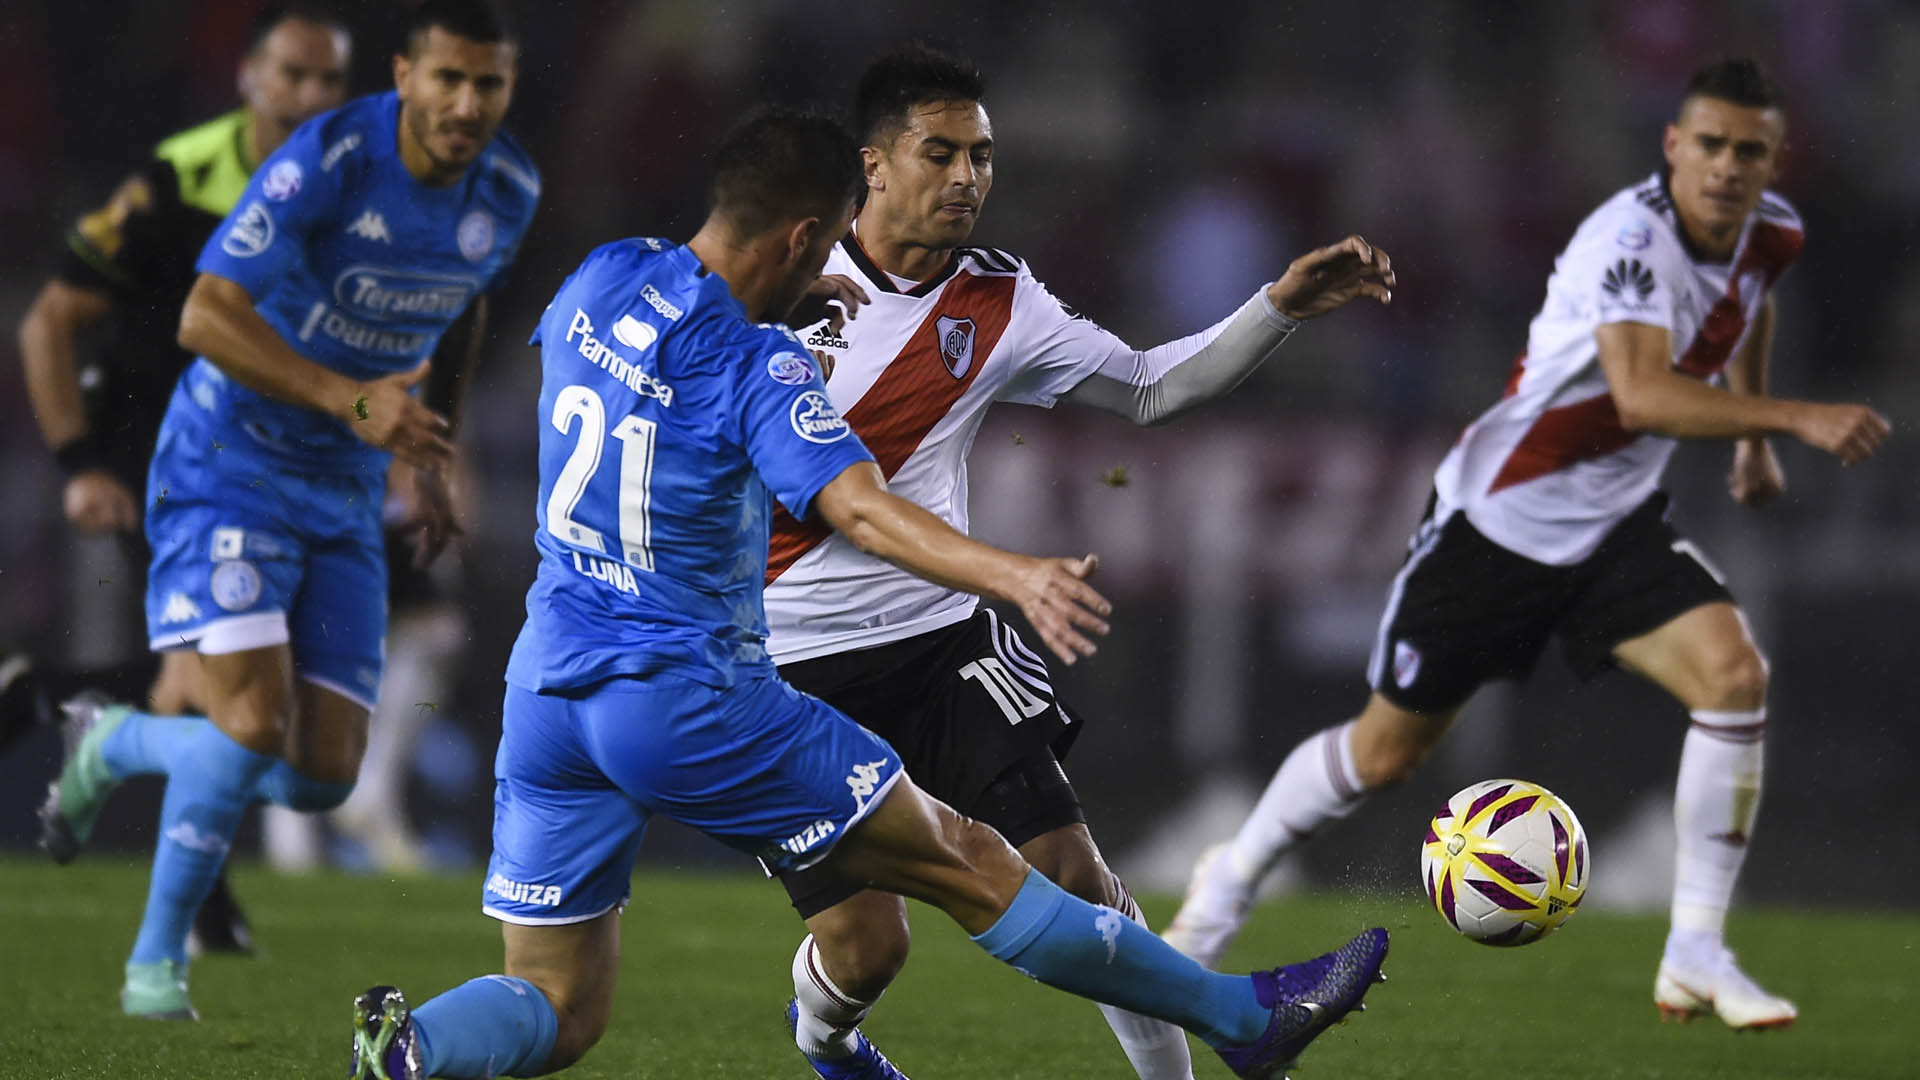 Pity Martinez River Belgrano Superliga argentina 1800818